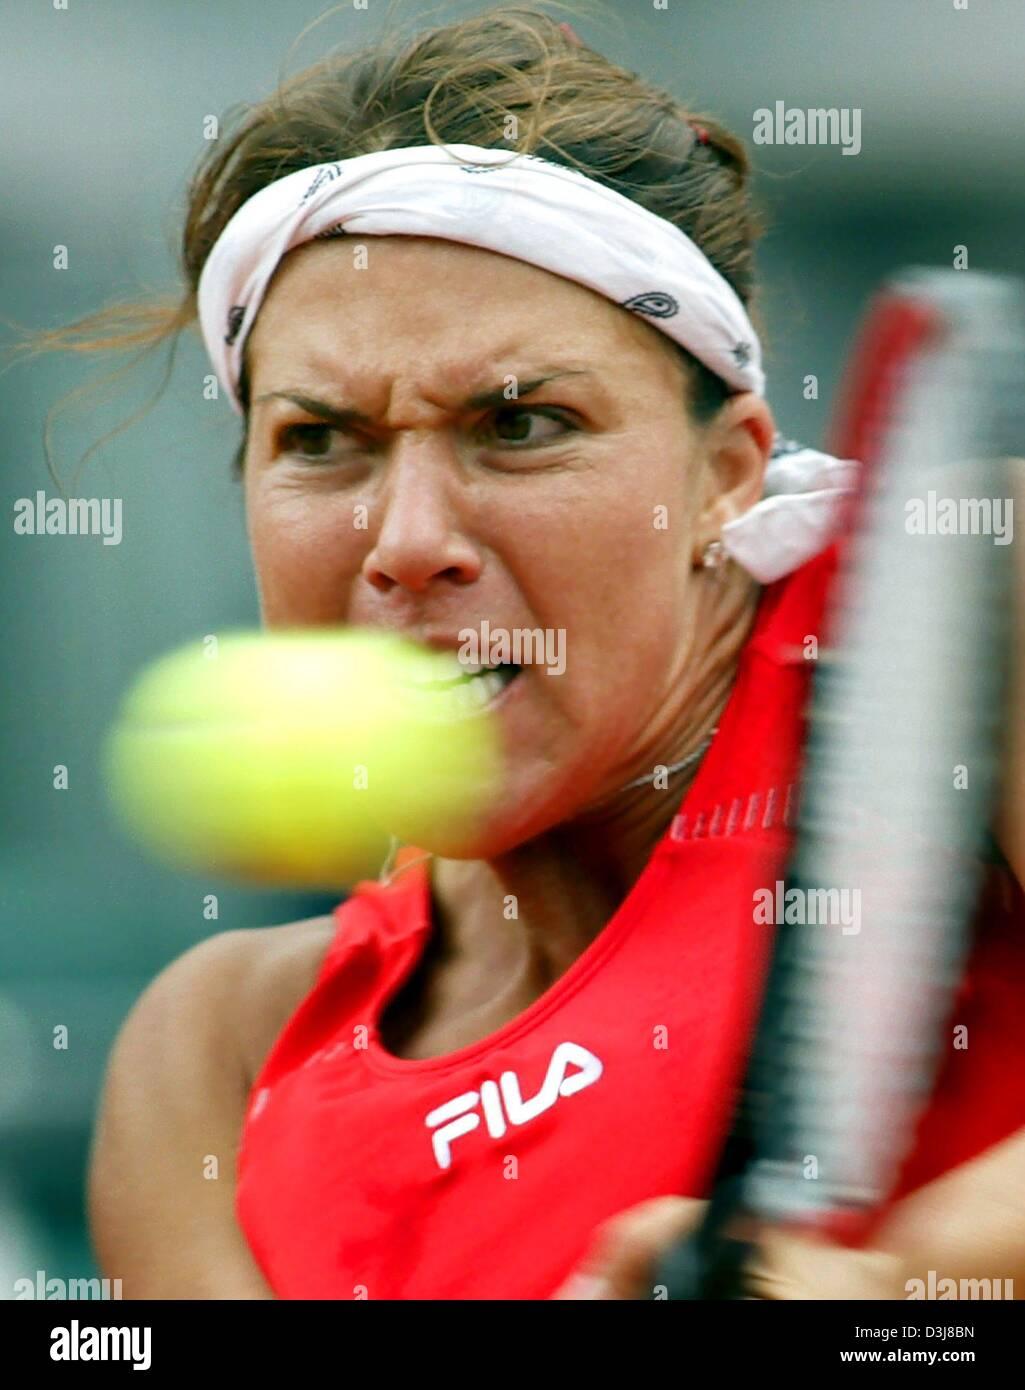 dpa US tennis player Jennifer Capriati returns the ball in the